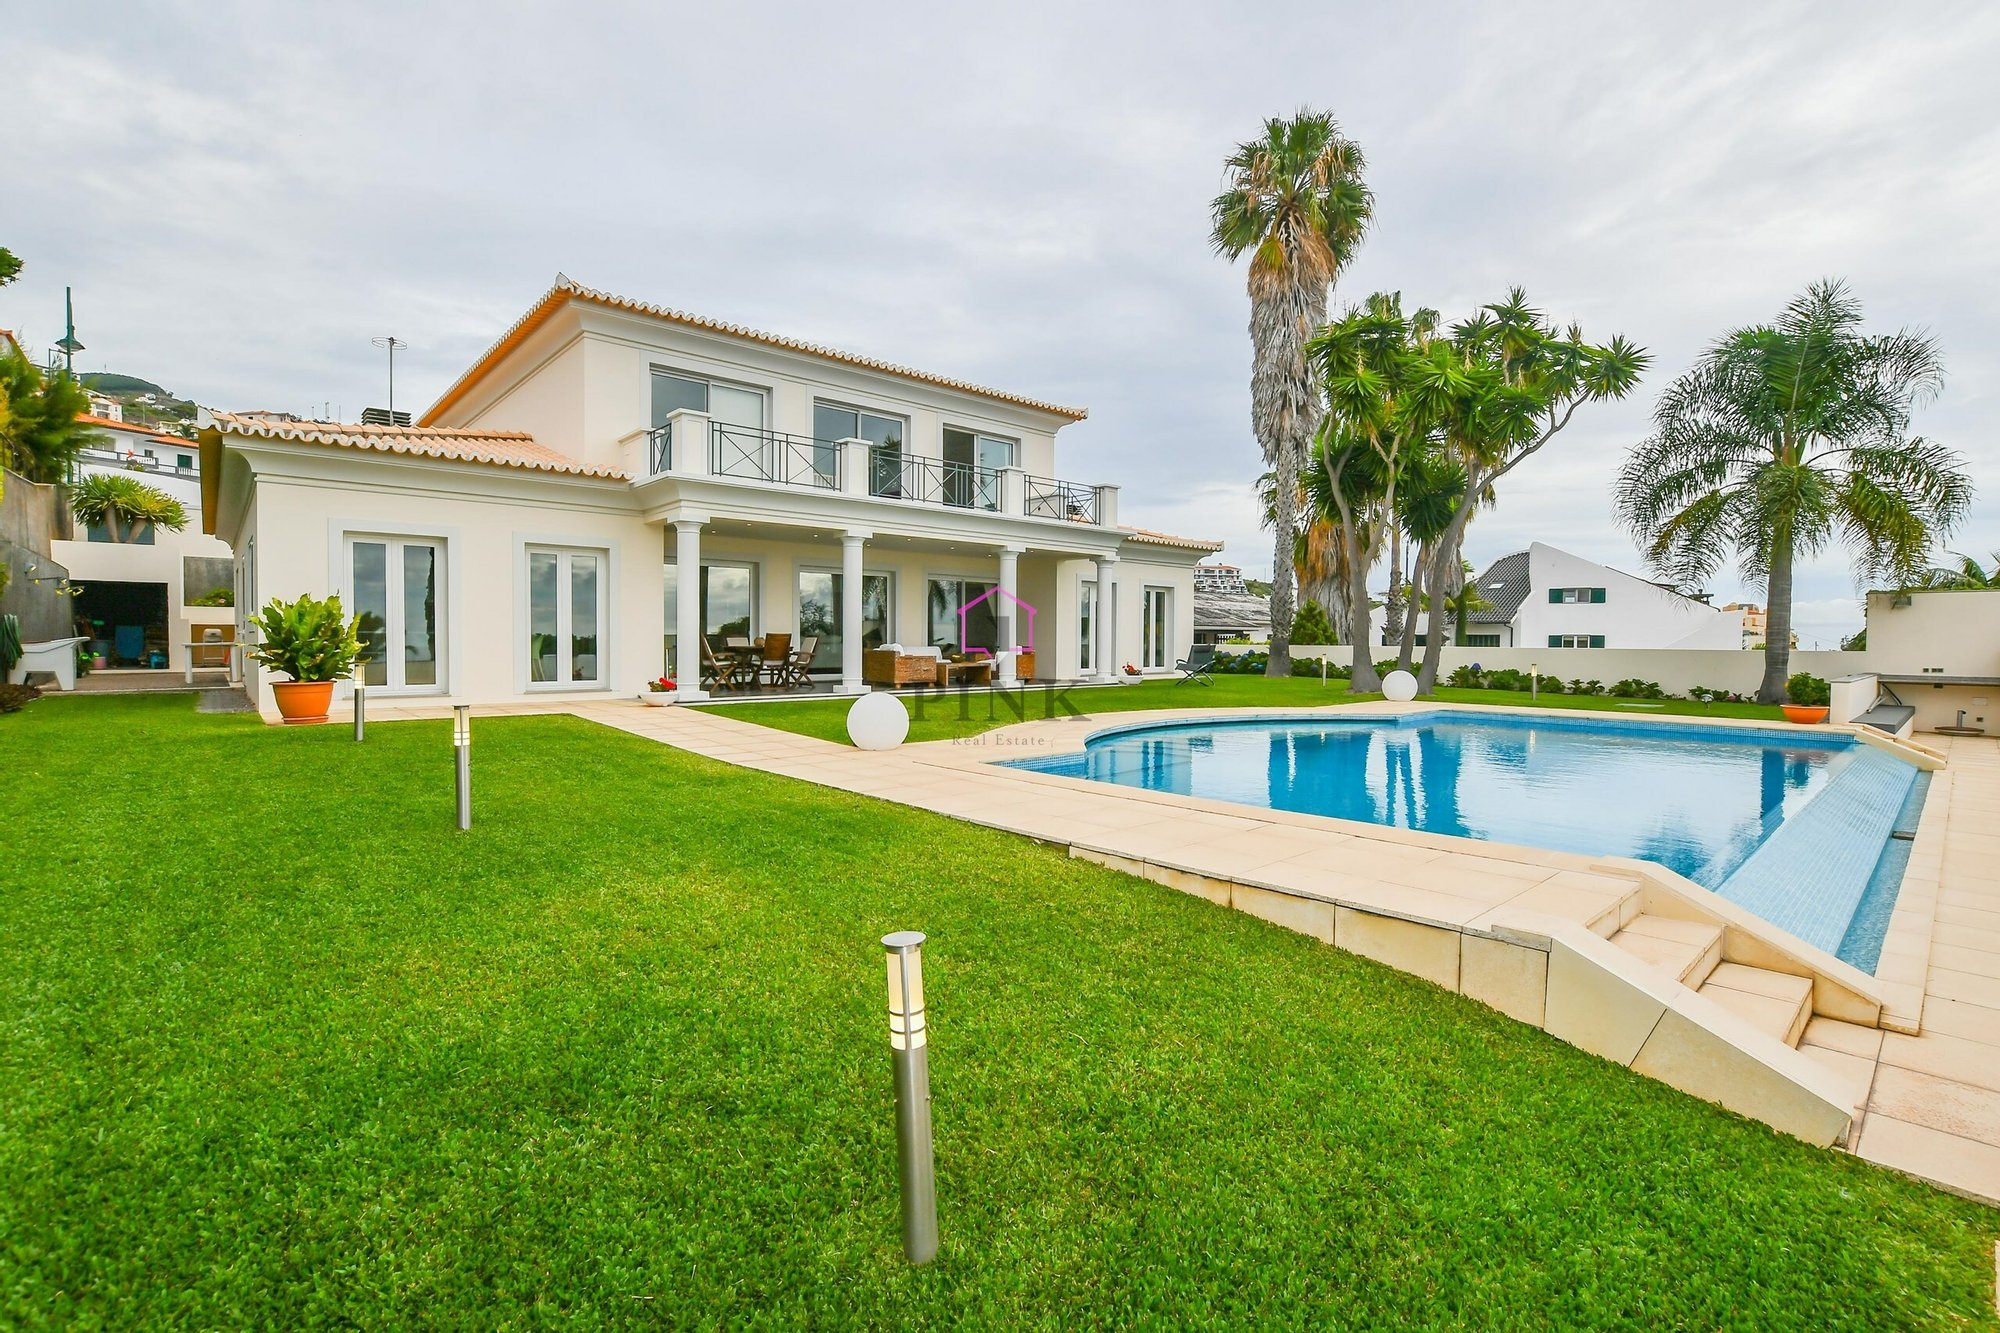 Villa in Santa Cruz, Madeira, Portugal 1